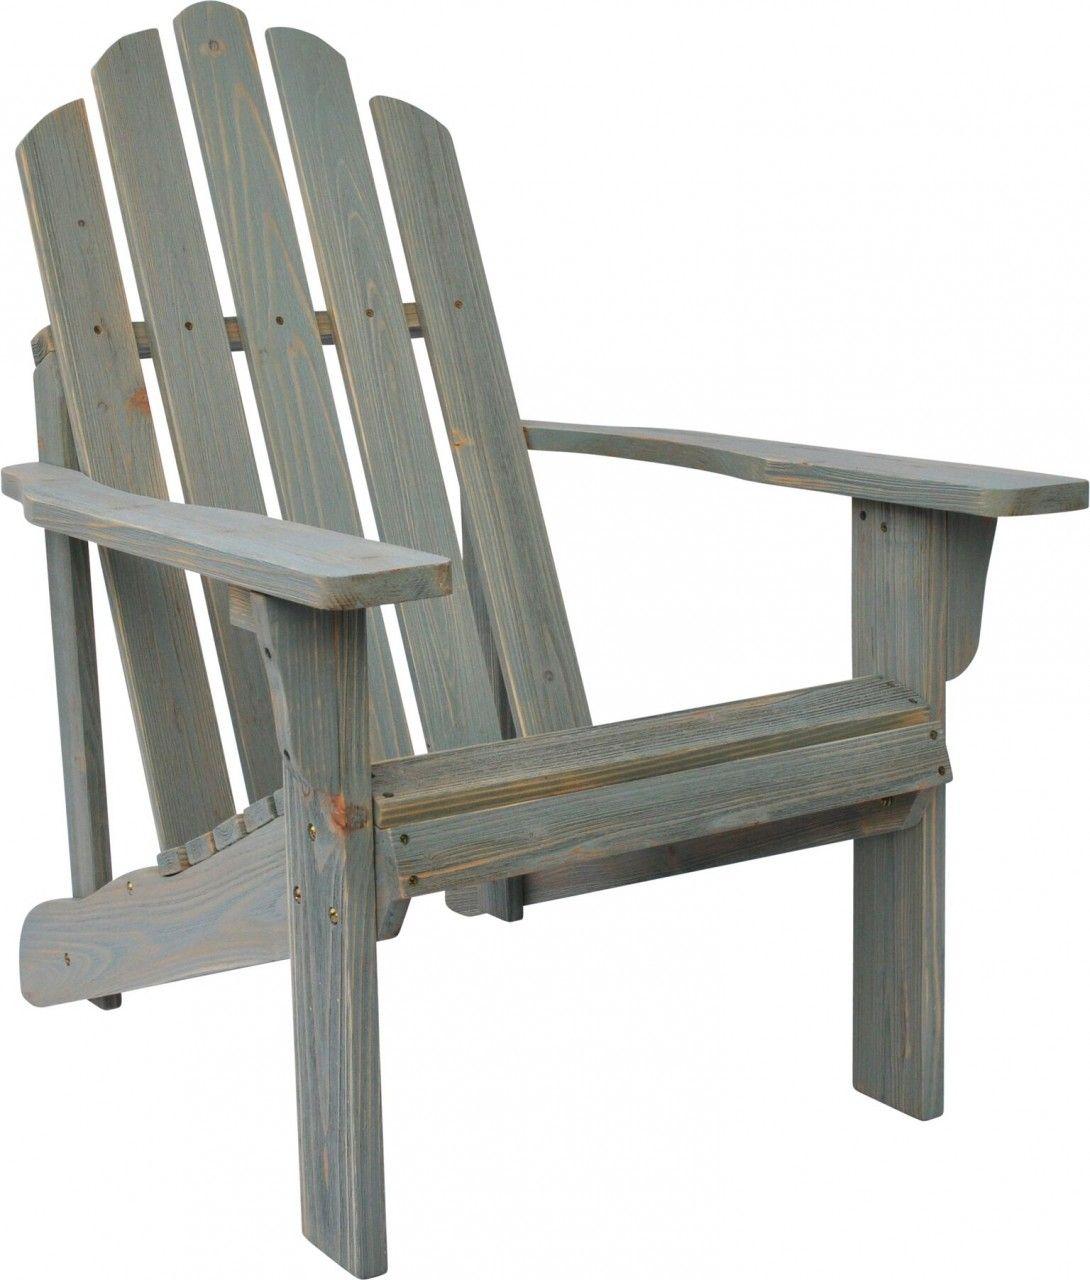 Shine Co Rustic Adirondack Chair In Dutch Blue Finish. Rustic Adirondack  ChairsAdirondack FurnitureOutdoor ...